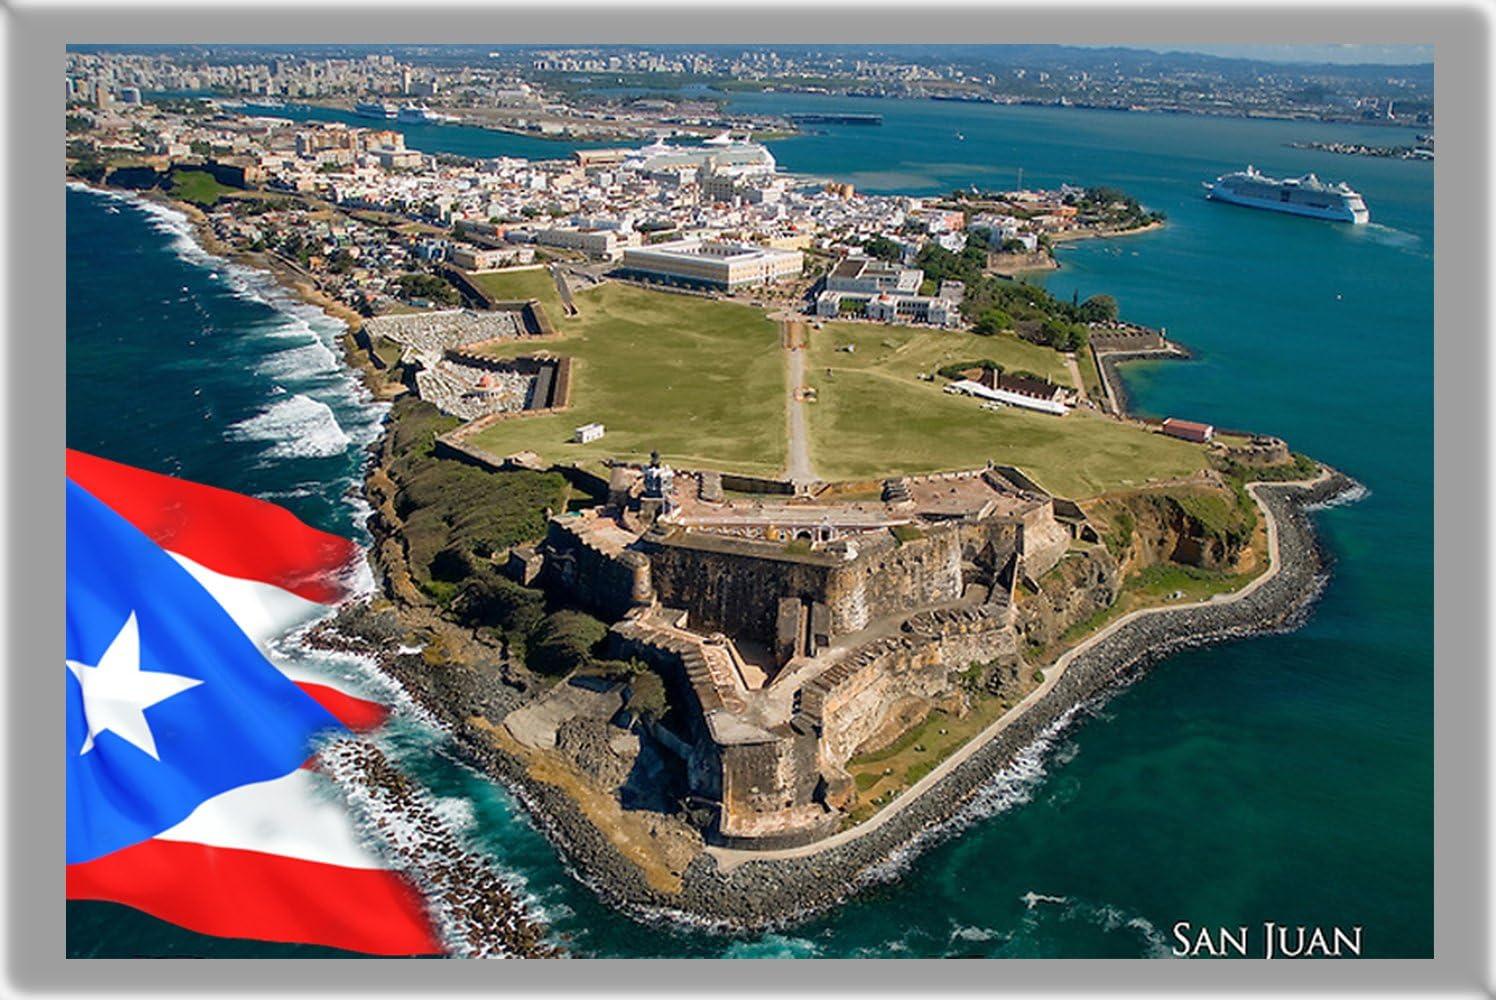 SAN JUAN REFRIGERATOR MAGNET FRIDGE MAGNET, THE CAPITAL CITY OF PUERTO RICO REFRIGERATOR MAGNET